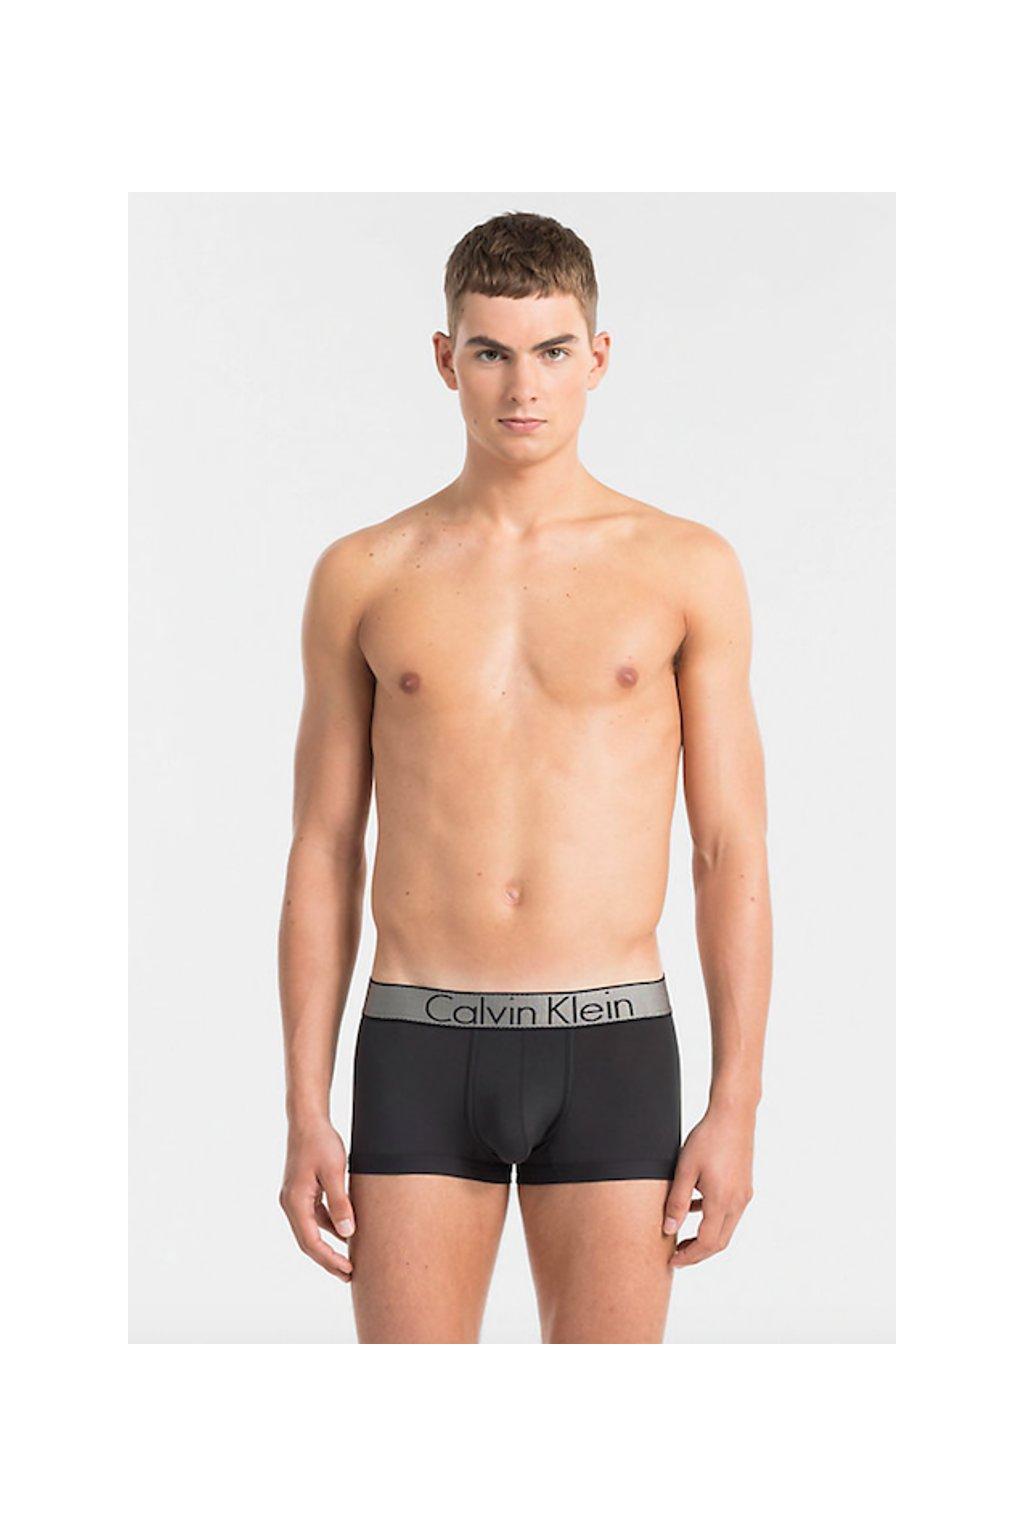 Calvin Klein Boxerky Customized Strech - černé